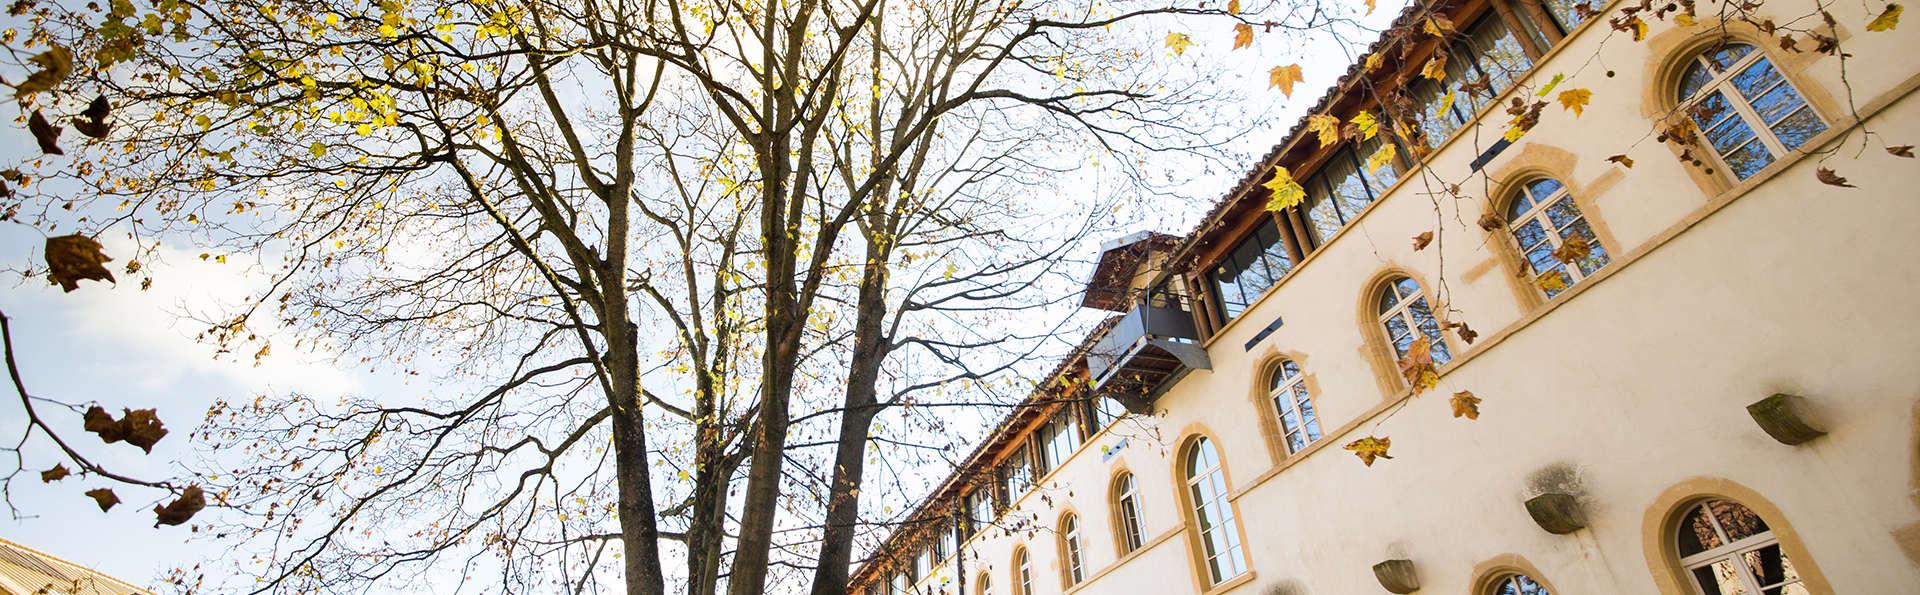 Hôtel La Citadelle - edit_front1.jpg